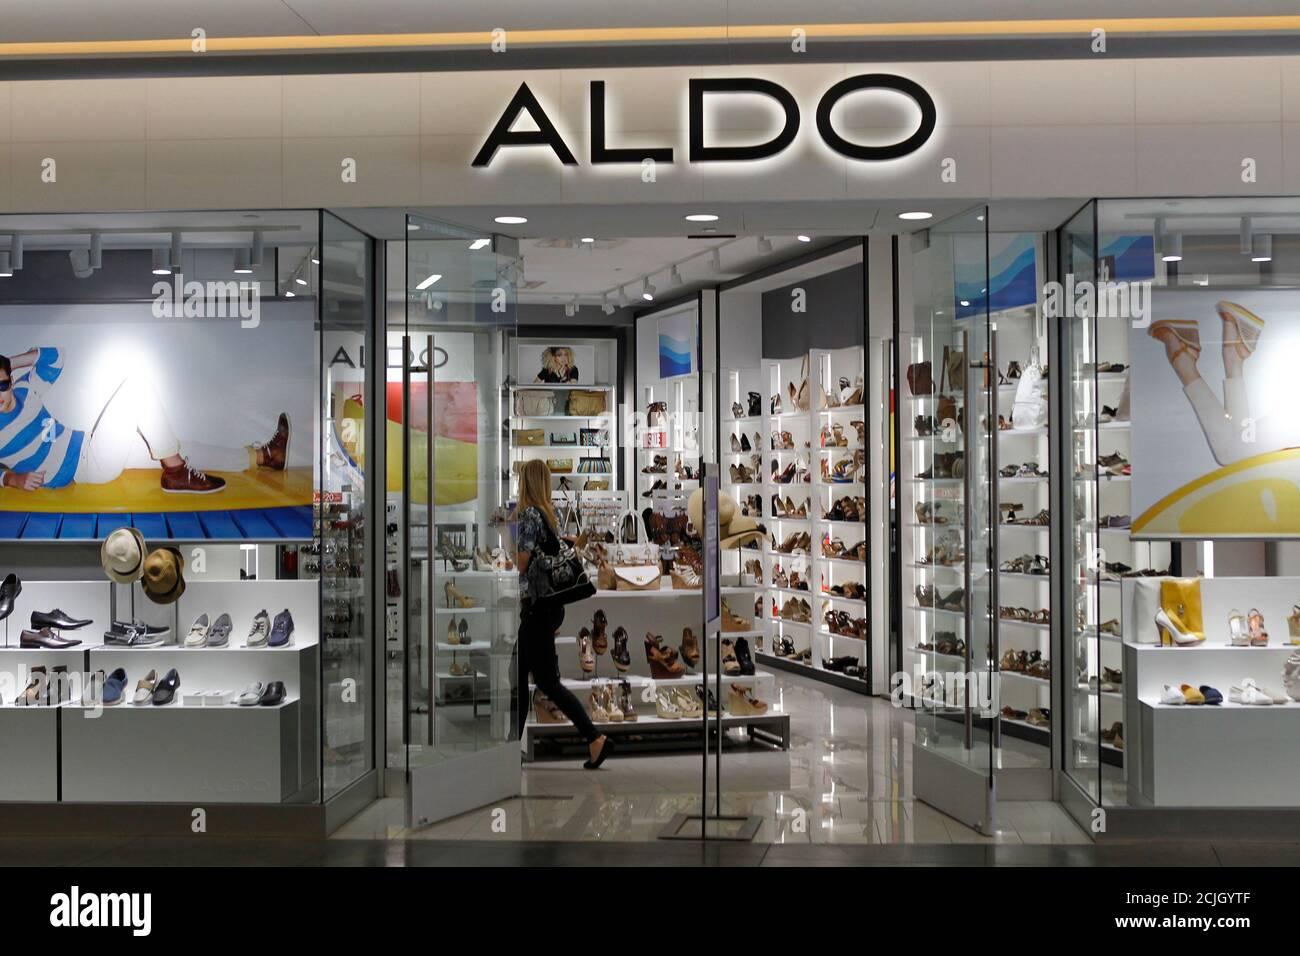 customer shops in an Aldo shoe boutique